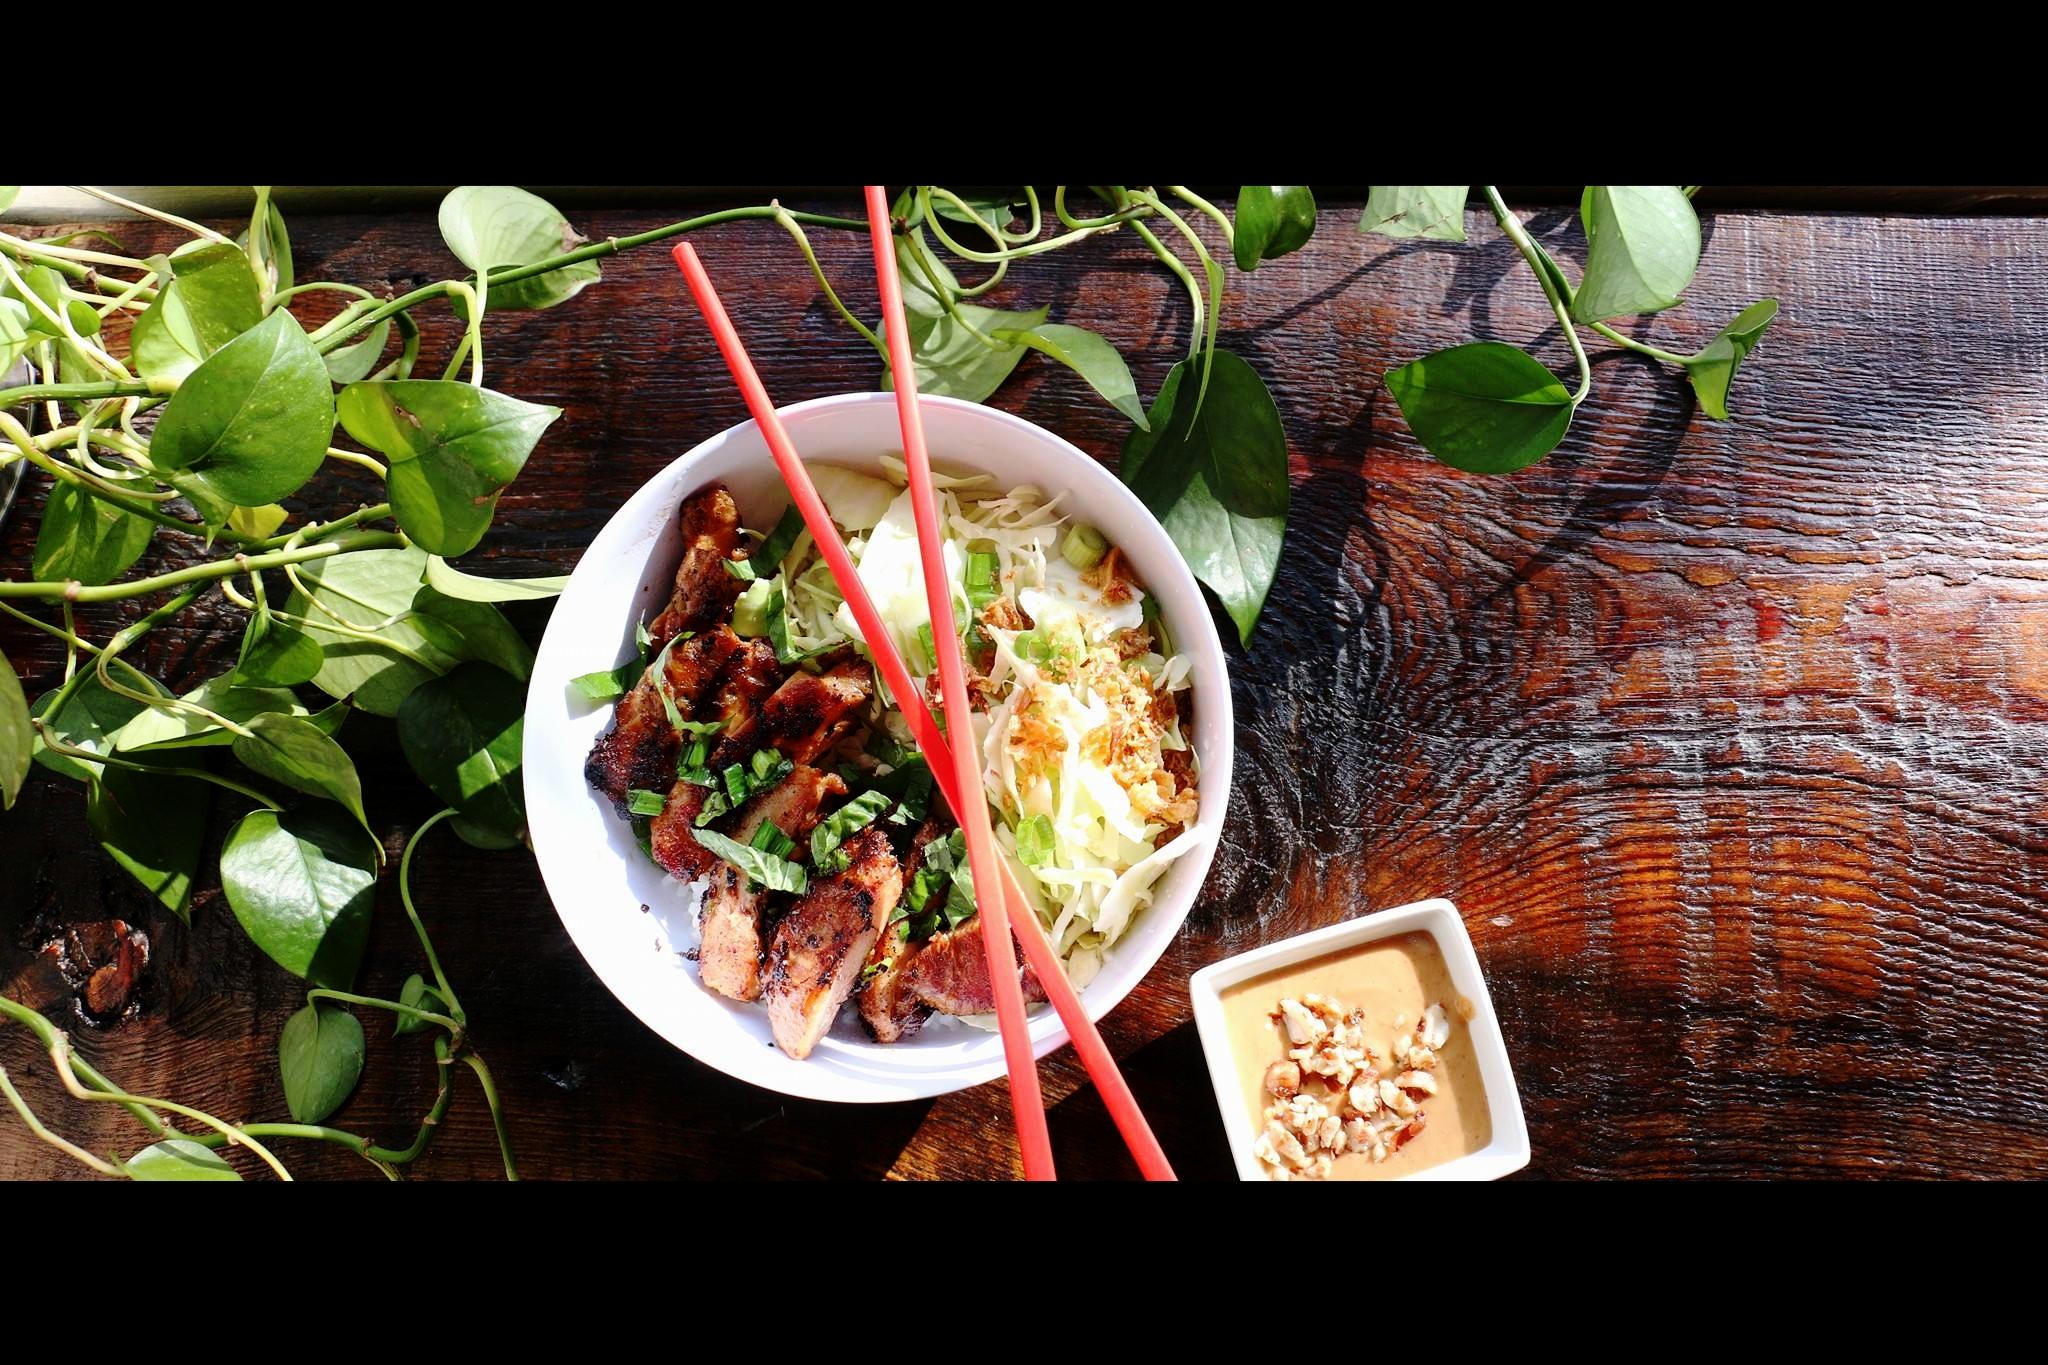 Nasi Ayam (Grilled Chicken atop Coconut Rice, Peanut Satay Sauce)